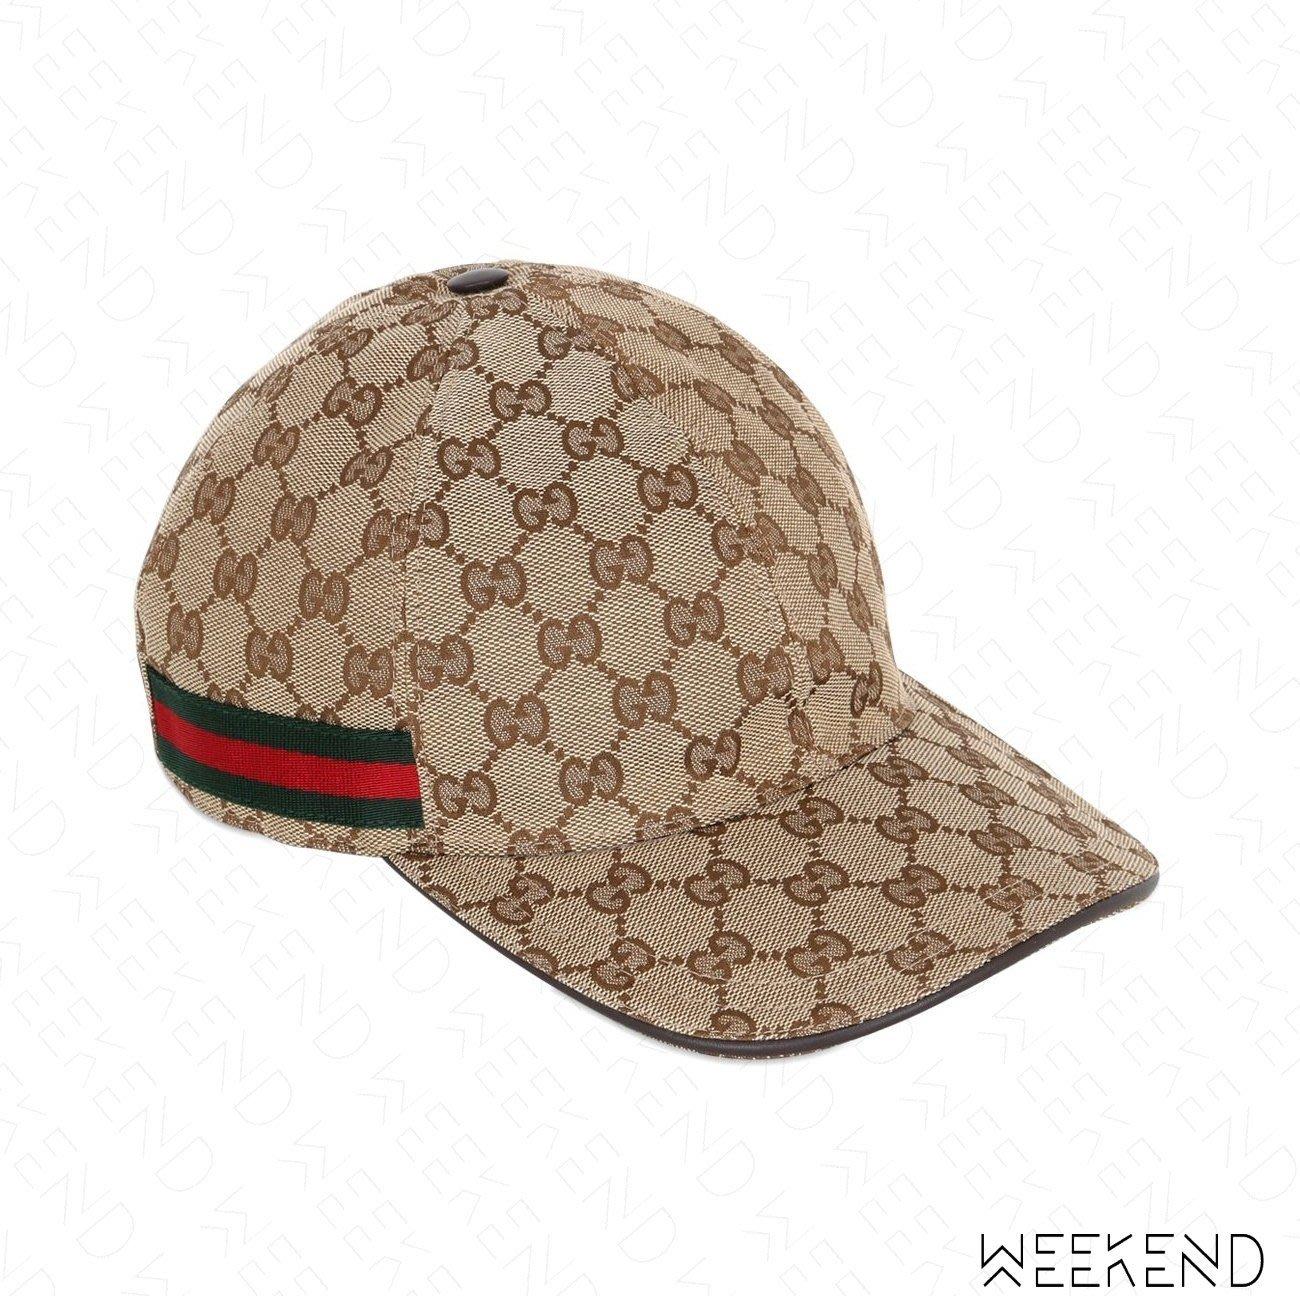 【WEEKEND】 現貨 GUCCI GG 經典 花紋 休閒帽 棒球帽 紅綠條紋 帽子 米色 200035 S/M